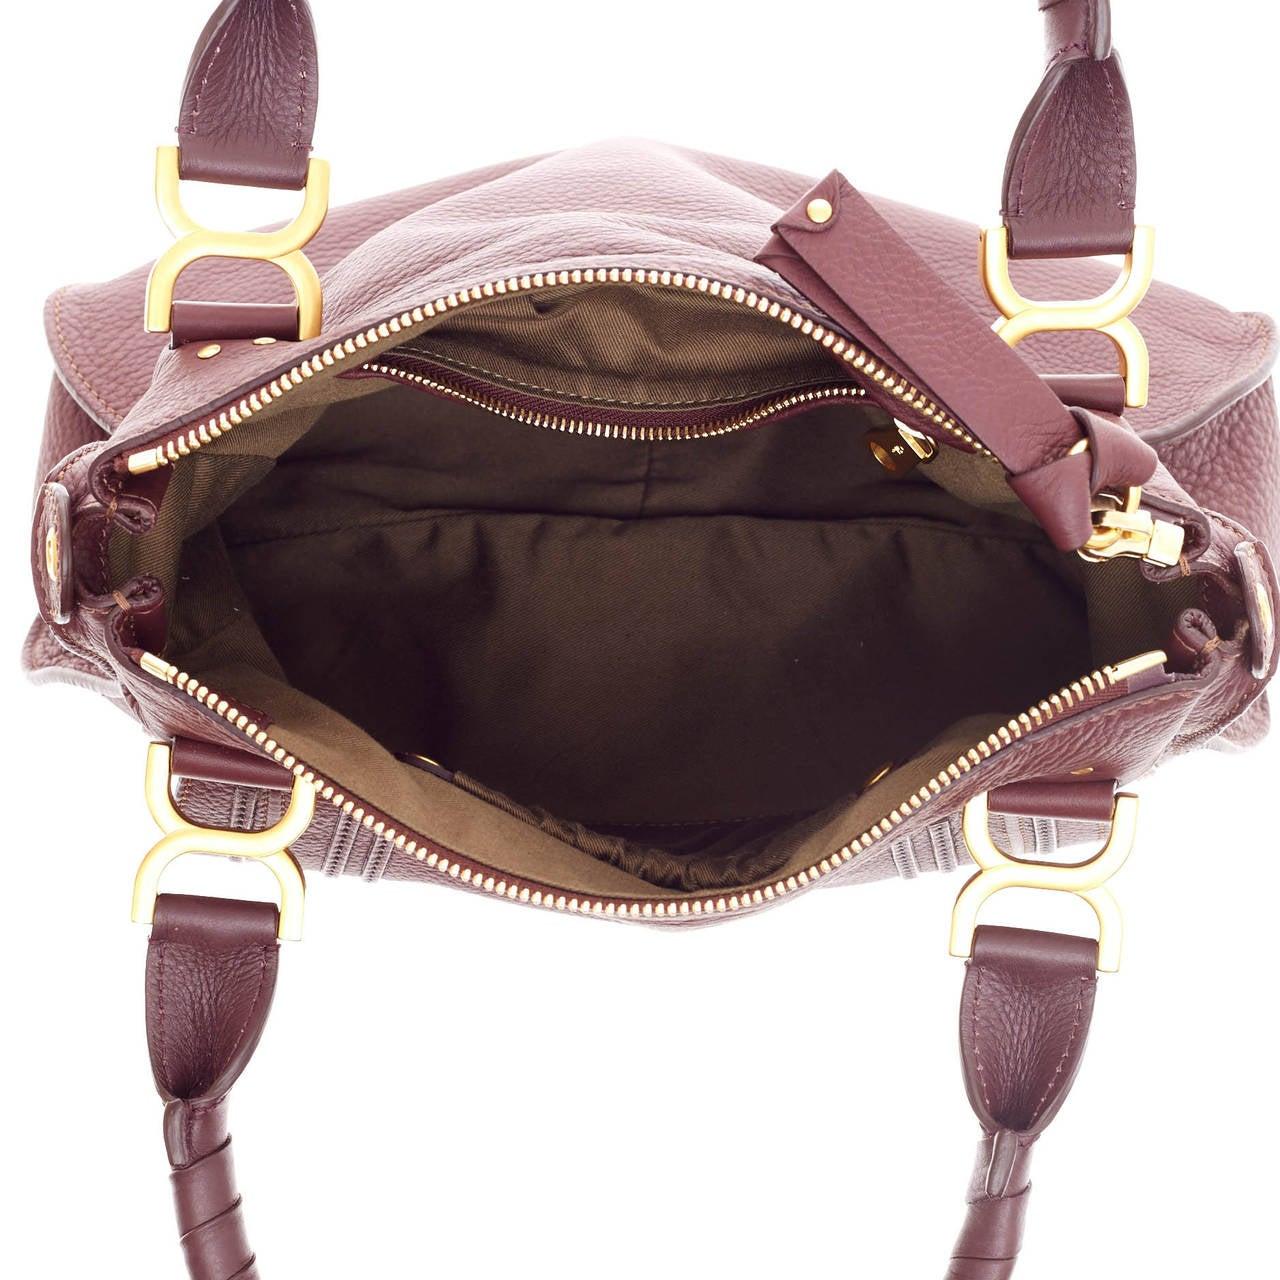 replica chloe - Chloe Marcie Top Handle Bag with Strap Leather Medium at 1stdibs